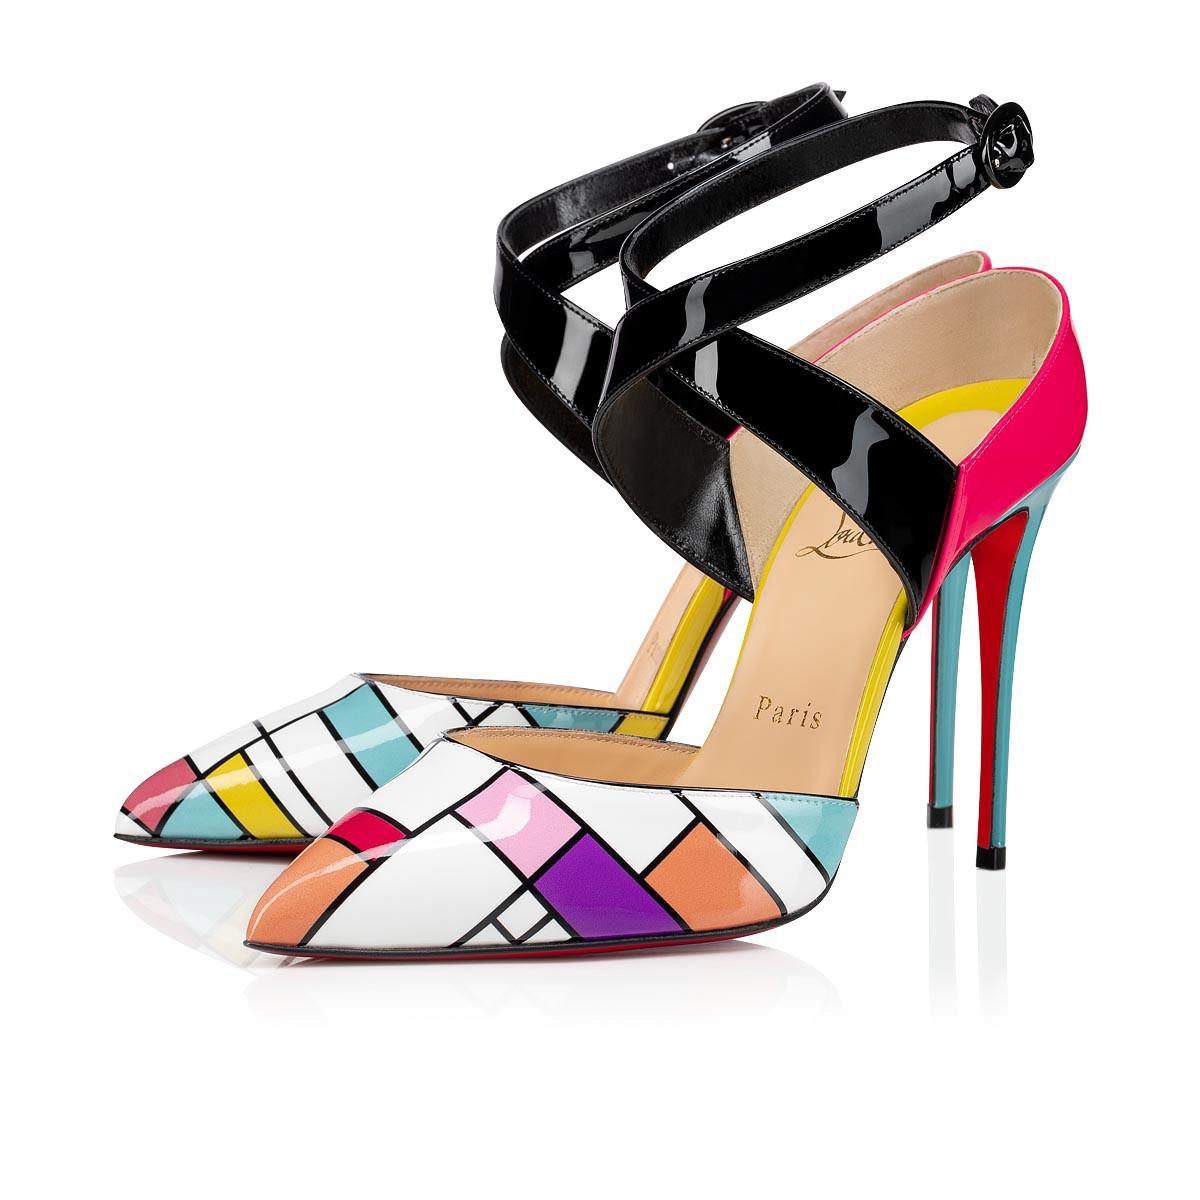 Shoes - Liloo - Christian Louboutin